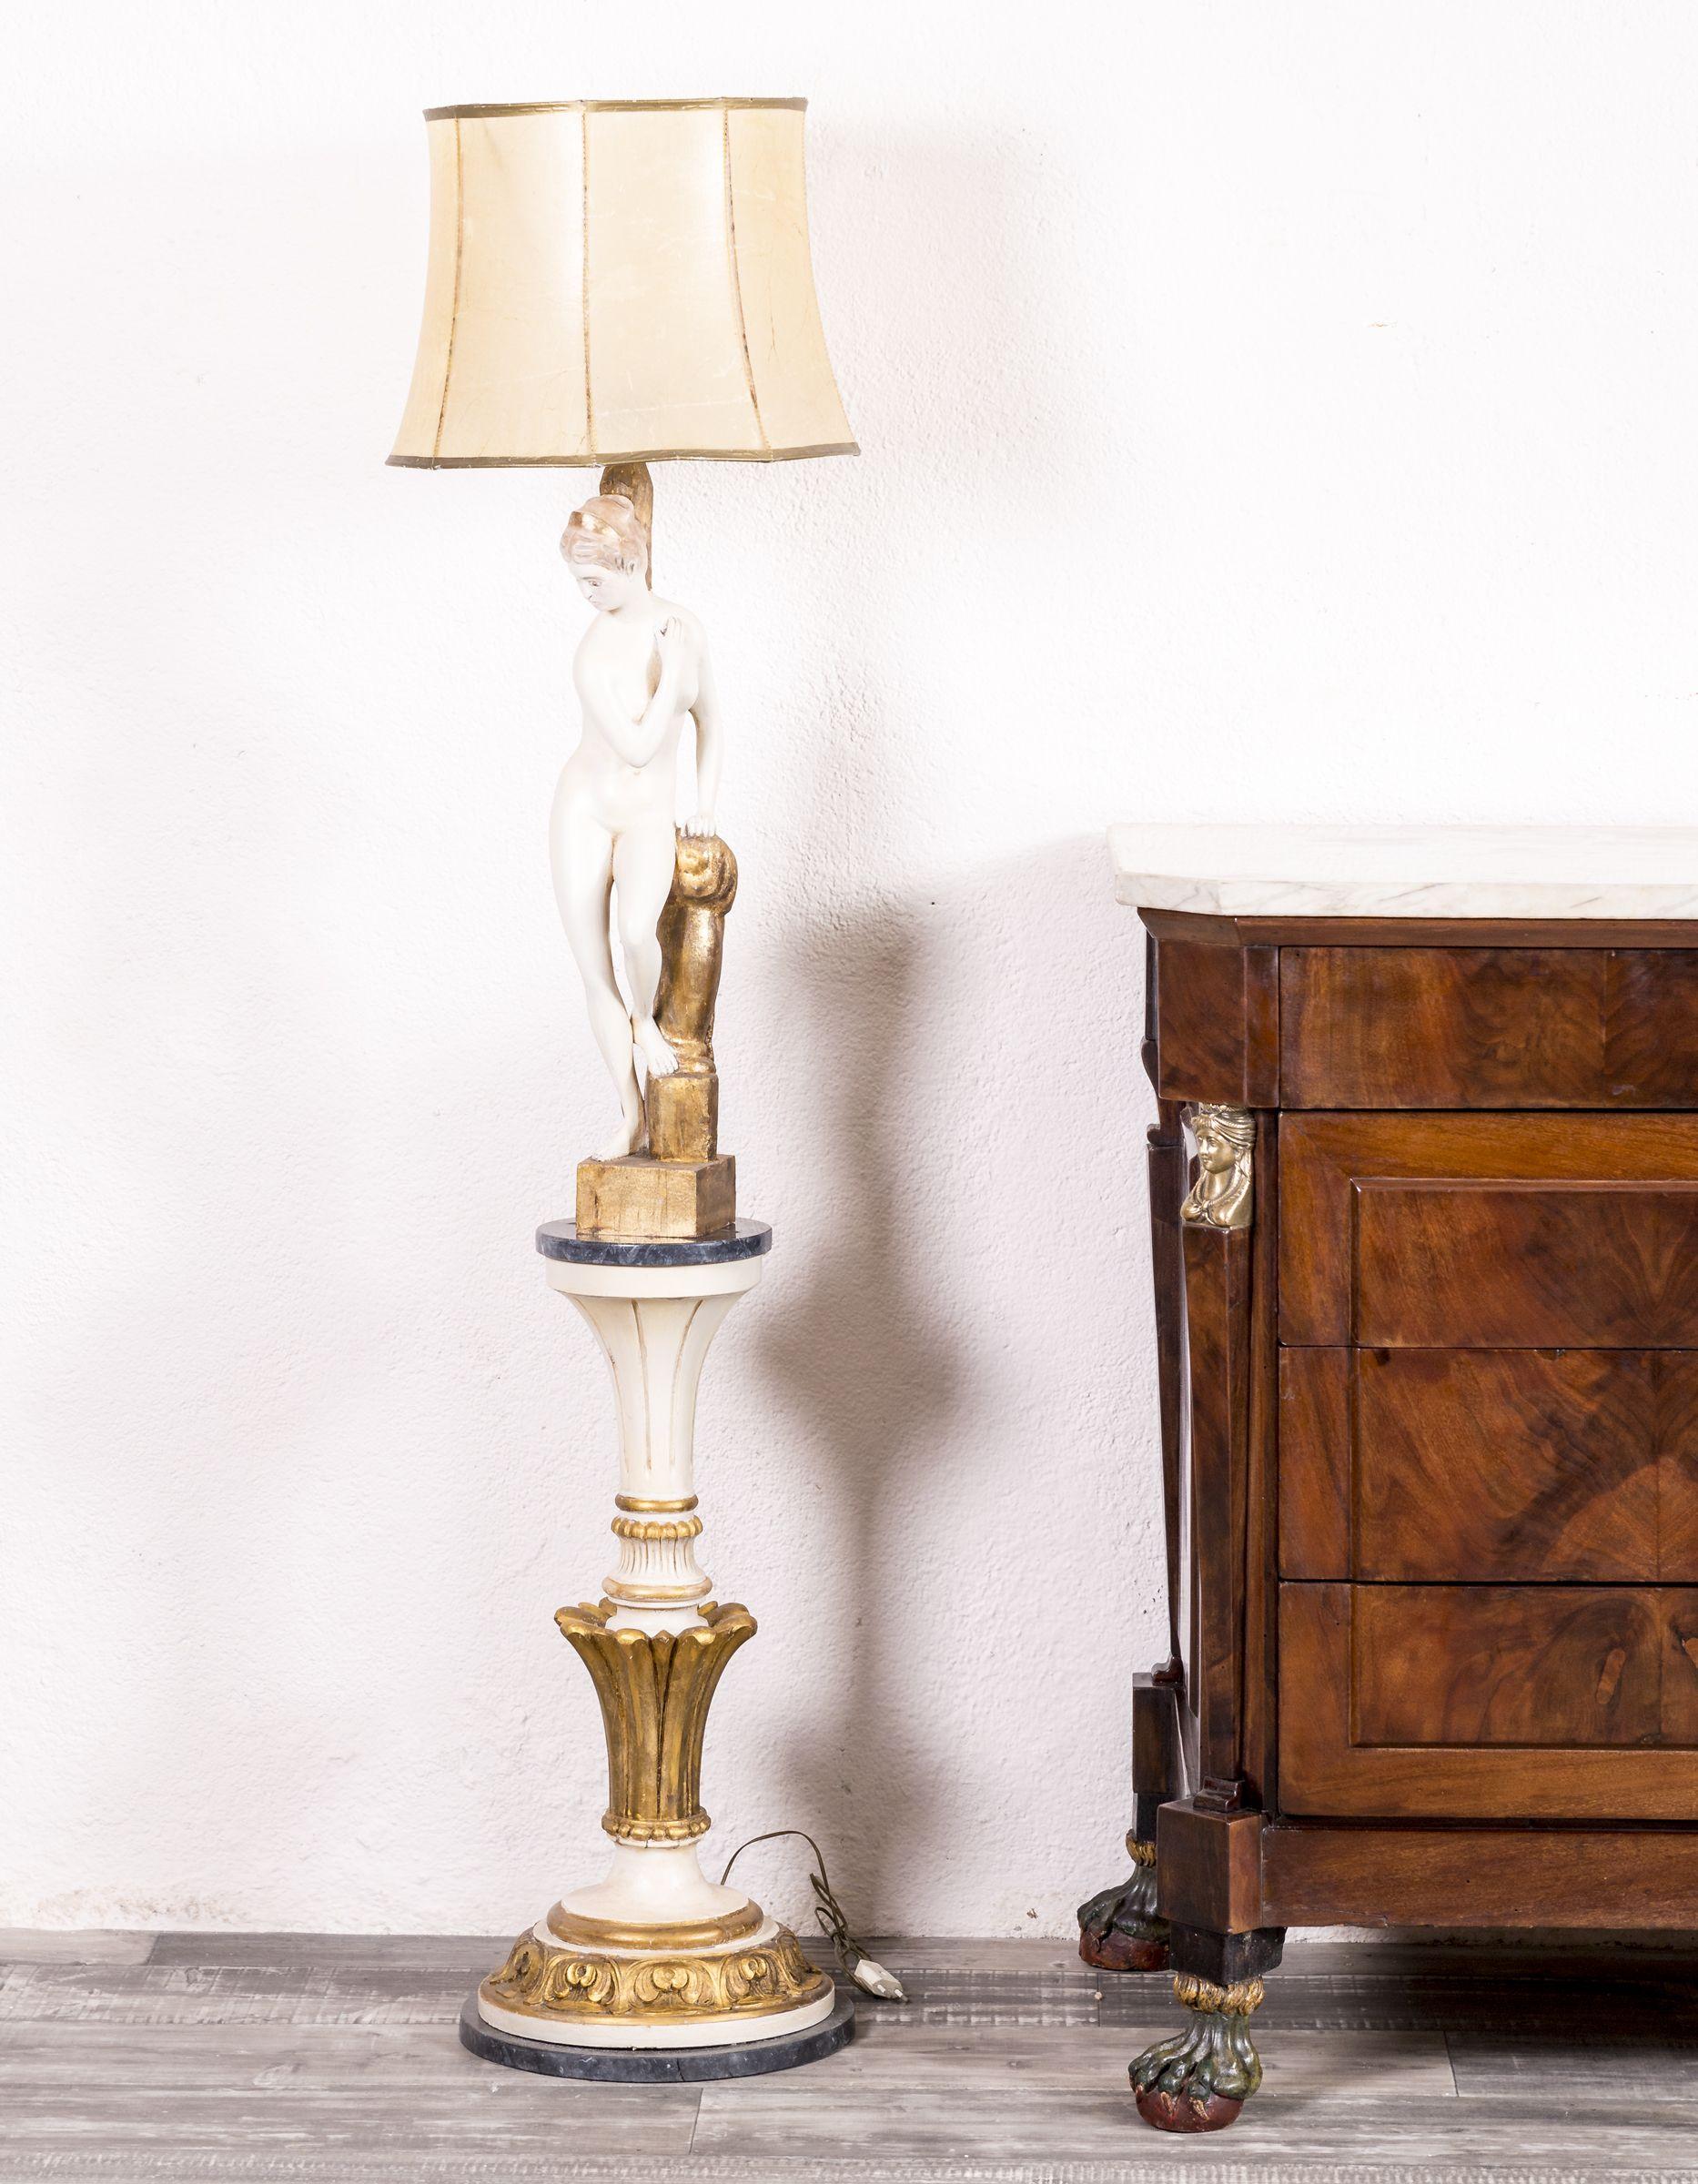 Lámpara De Pie Realizada Sobre Talla De Madera Maciza Policromada Y Pan De Oro Data De Finales De Siglo Xix Lamp Lámparas De Pie Lámparas Modernas Lámpara